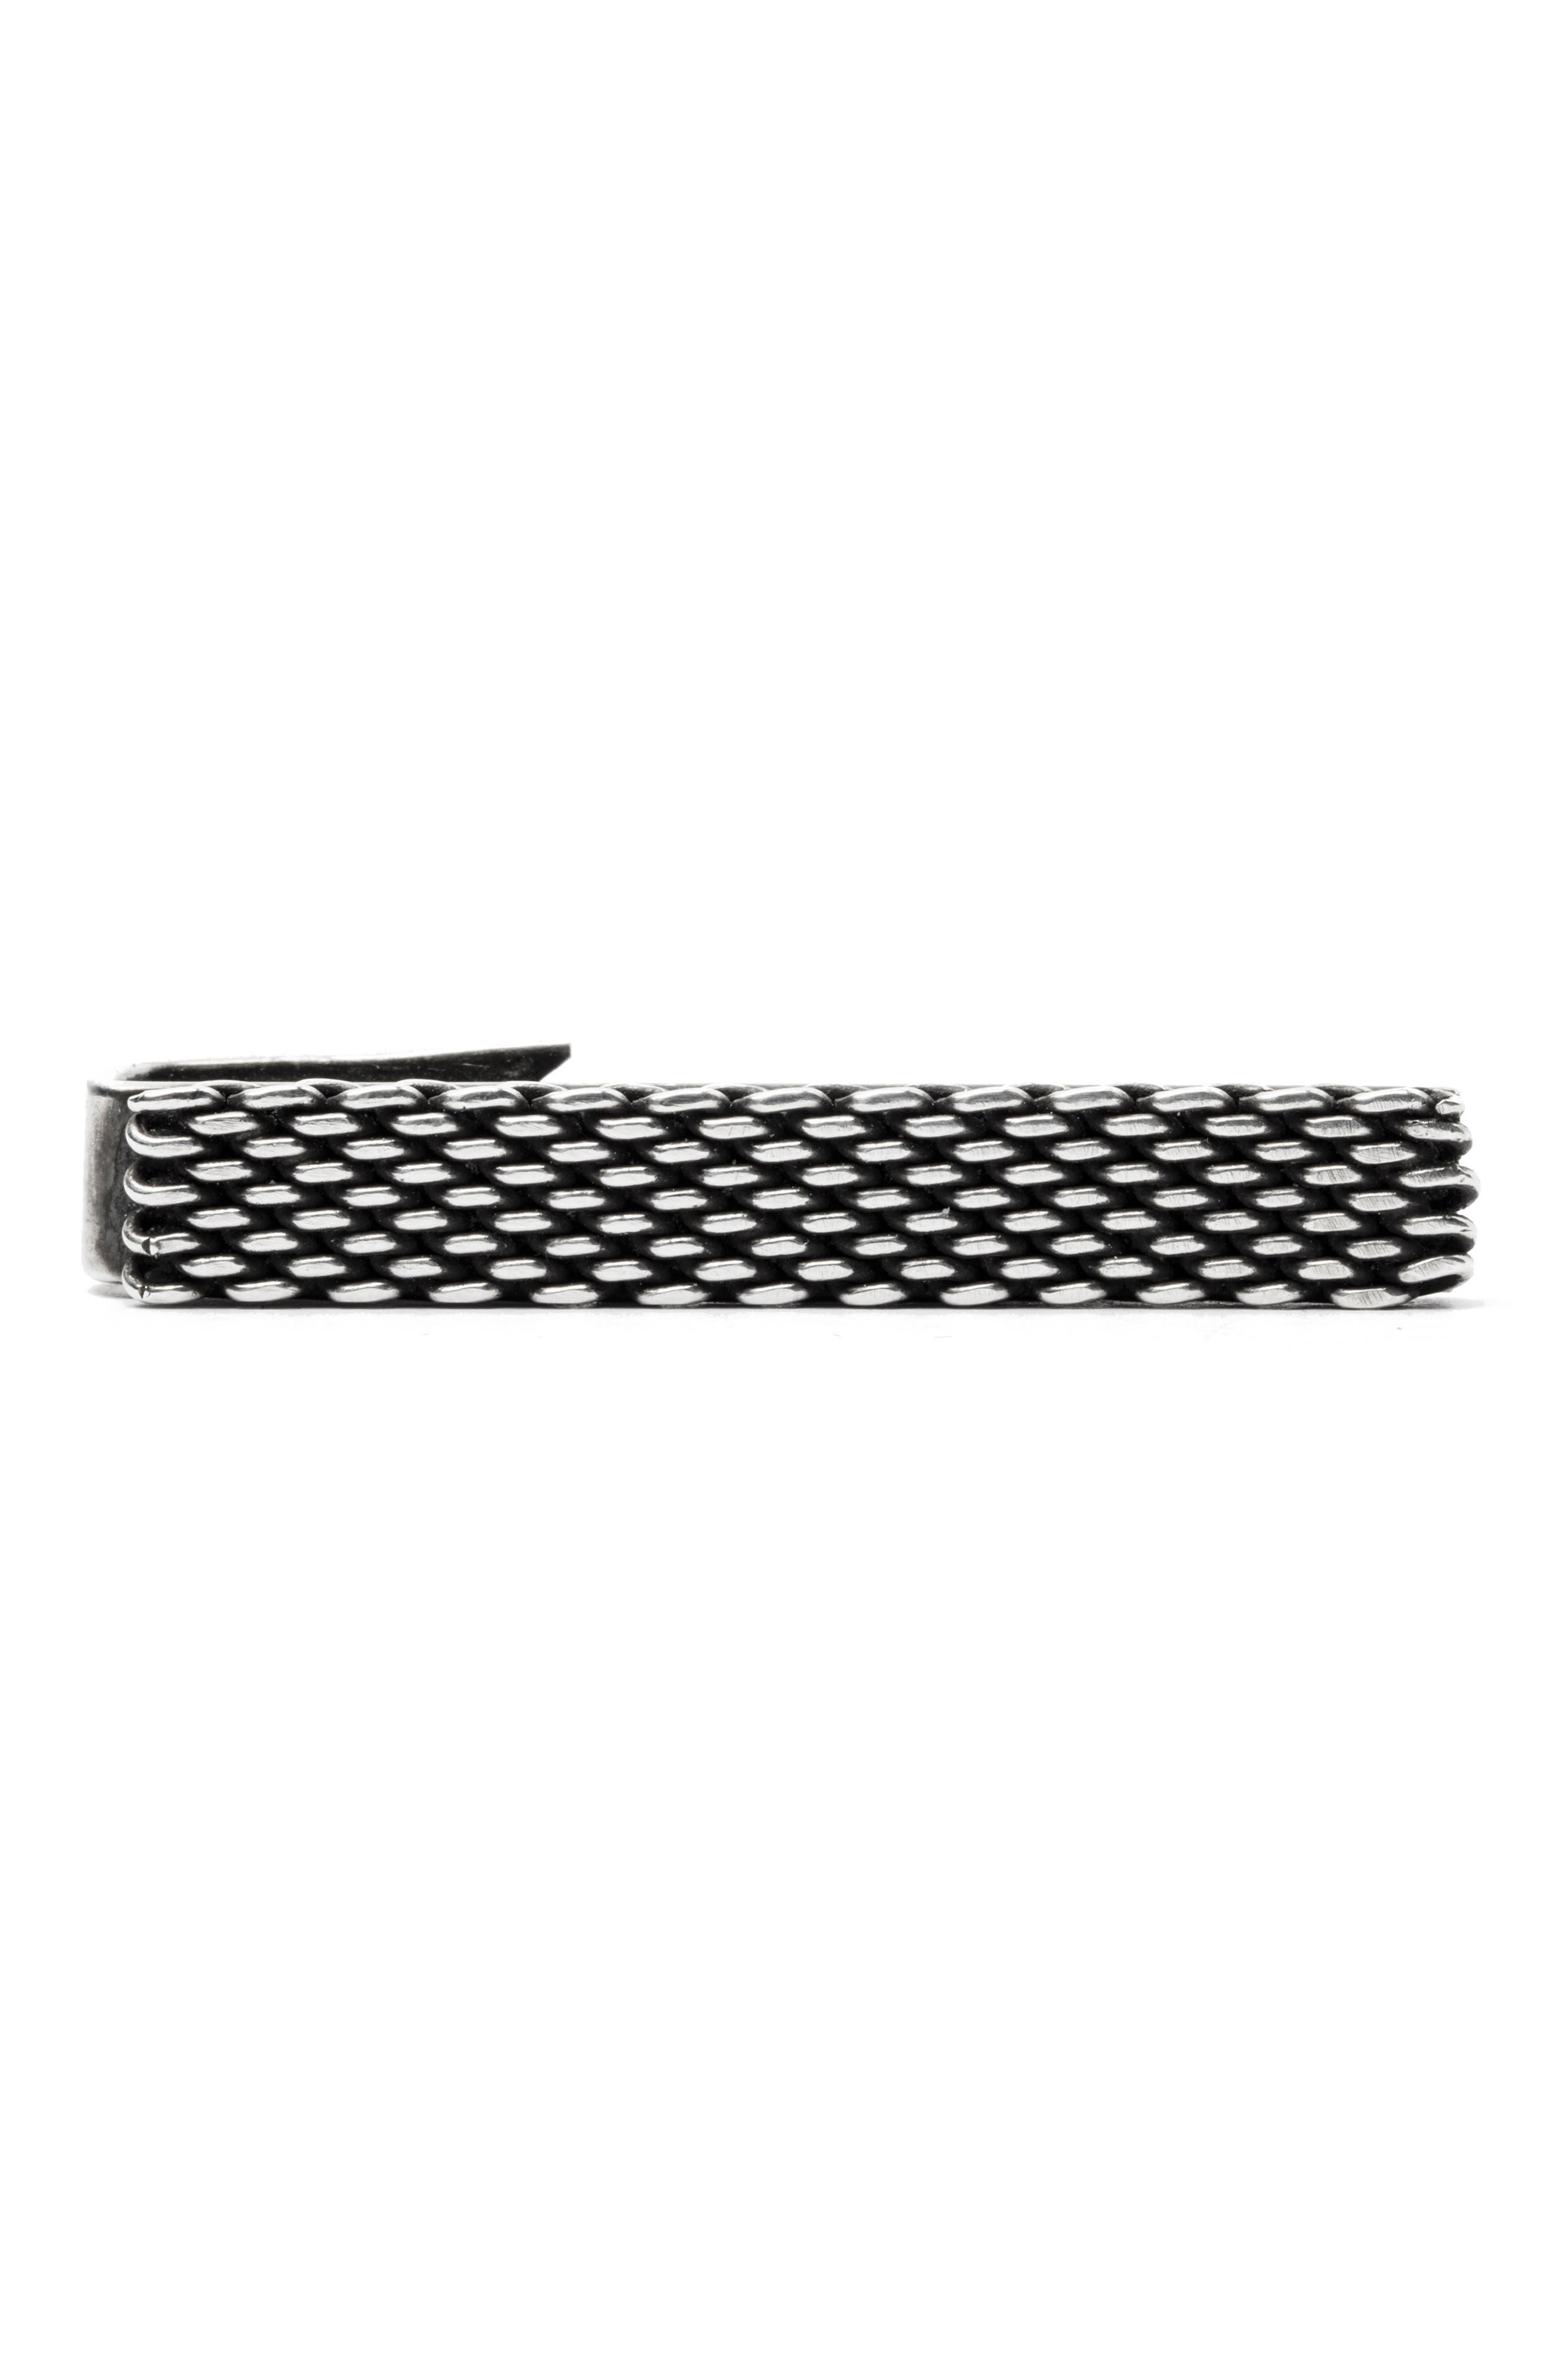 Mesh Band Tie Clip,                         Main,                         color, SILVER